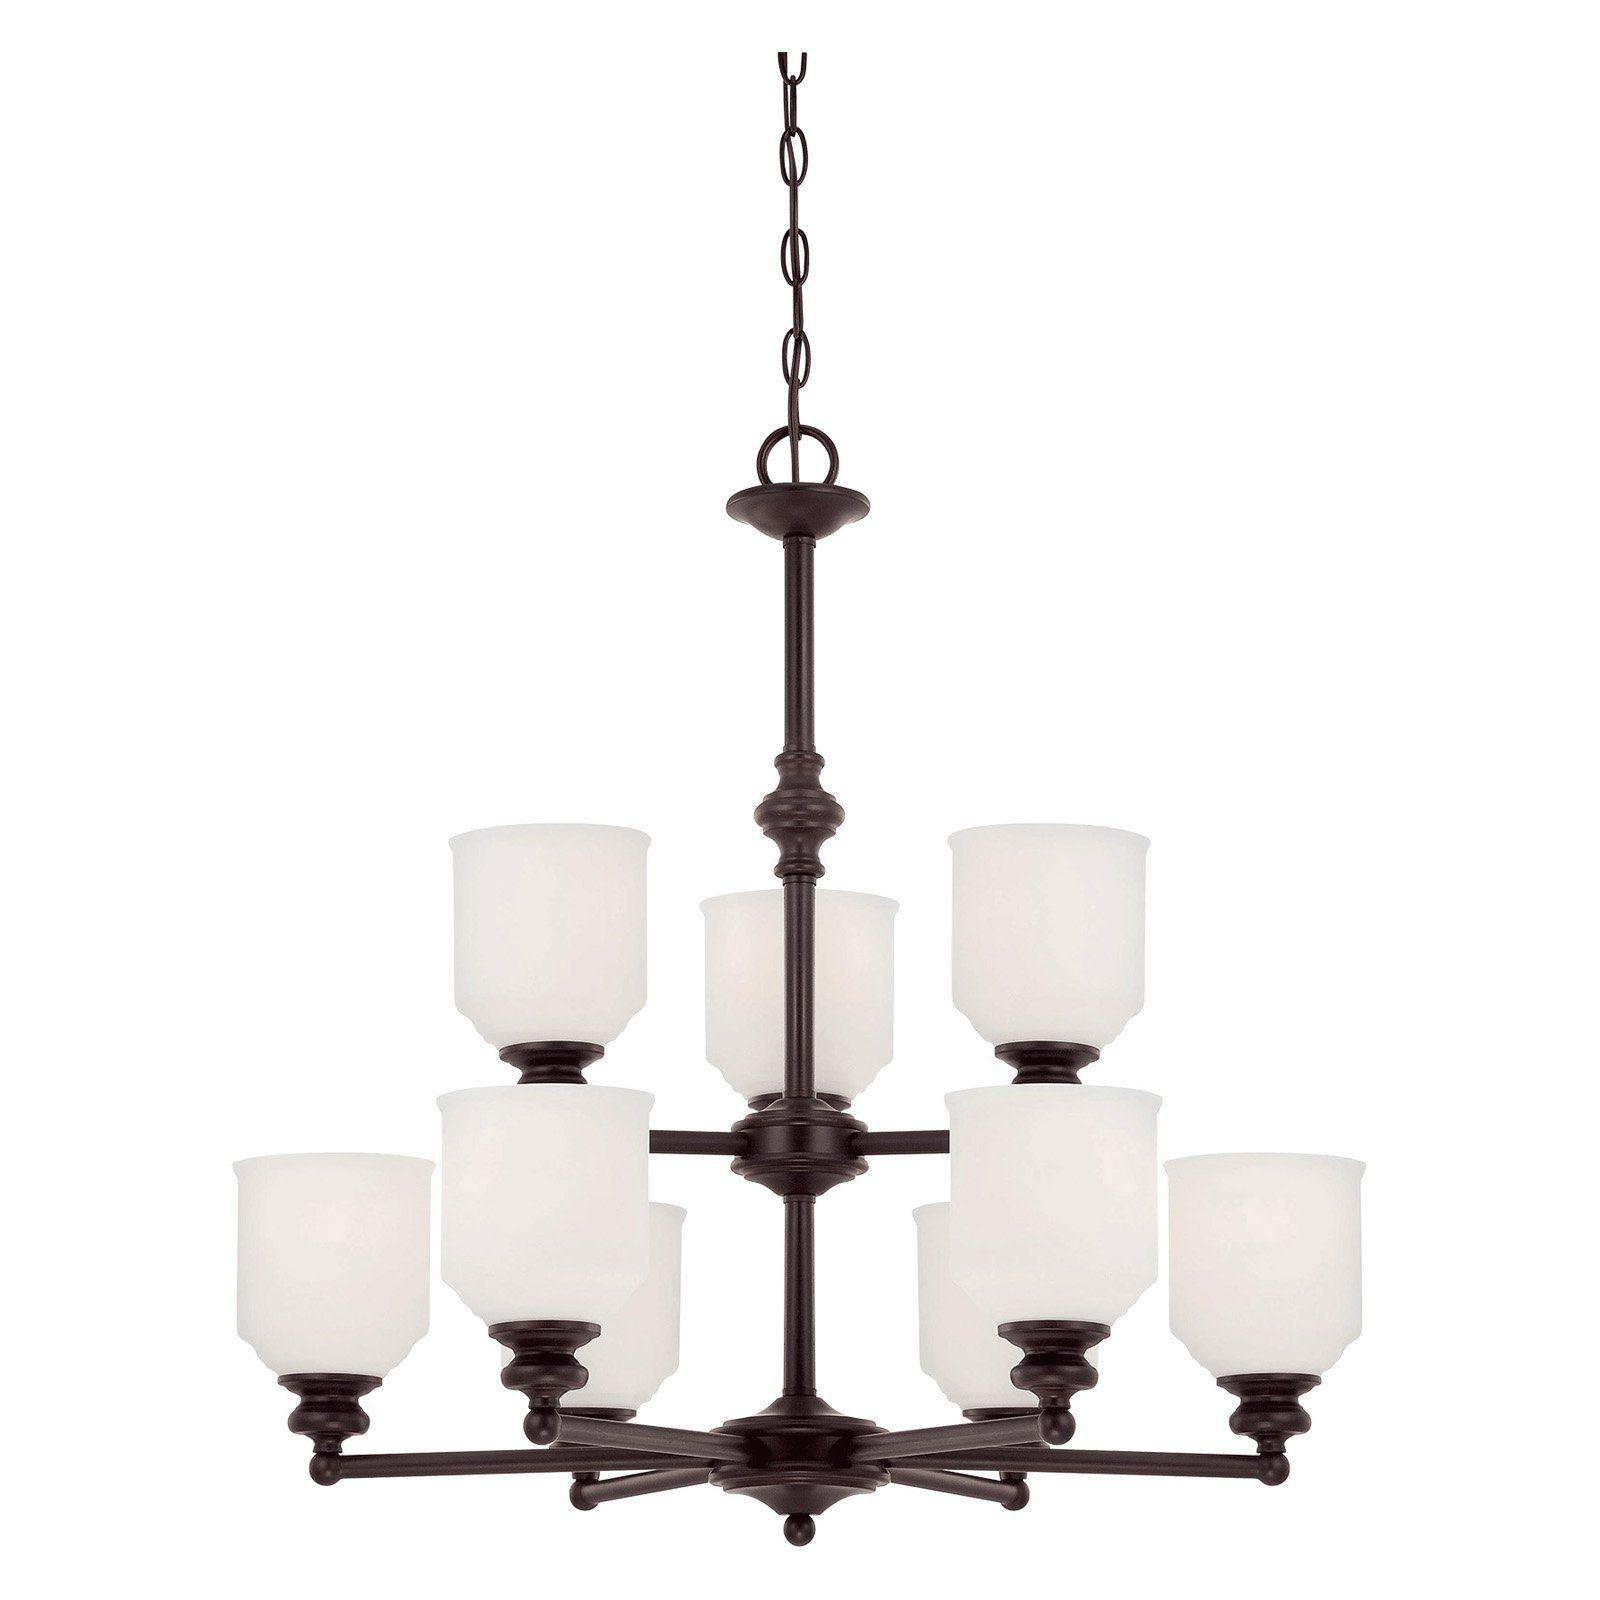 Savoy house melrose 1 6838 9 chandelier chandelier lighting chandeliers cincinnati